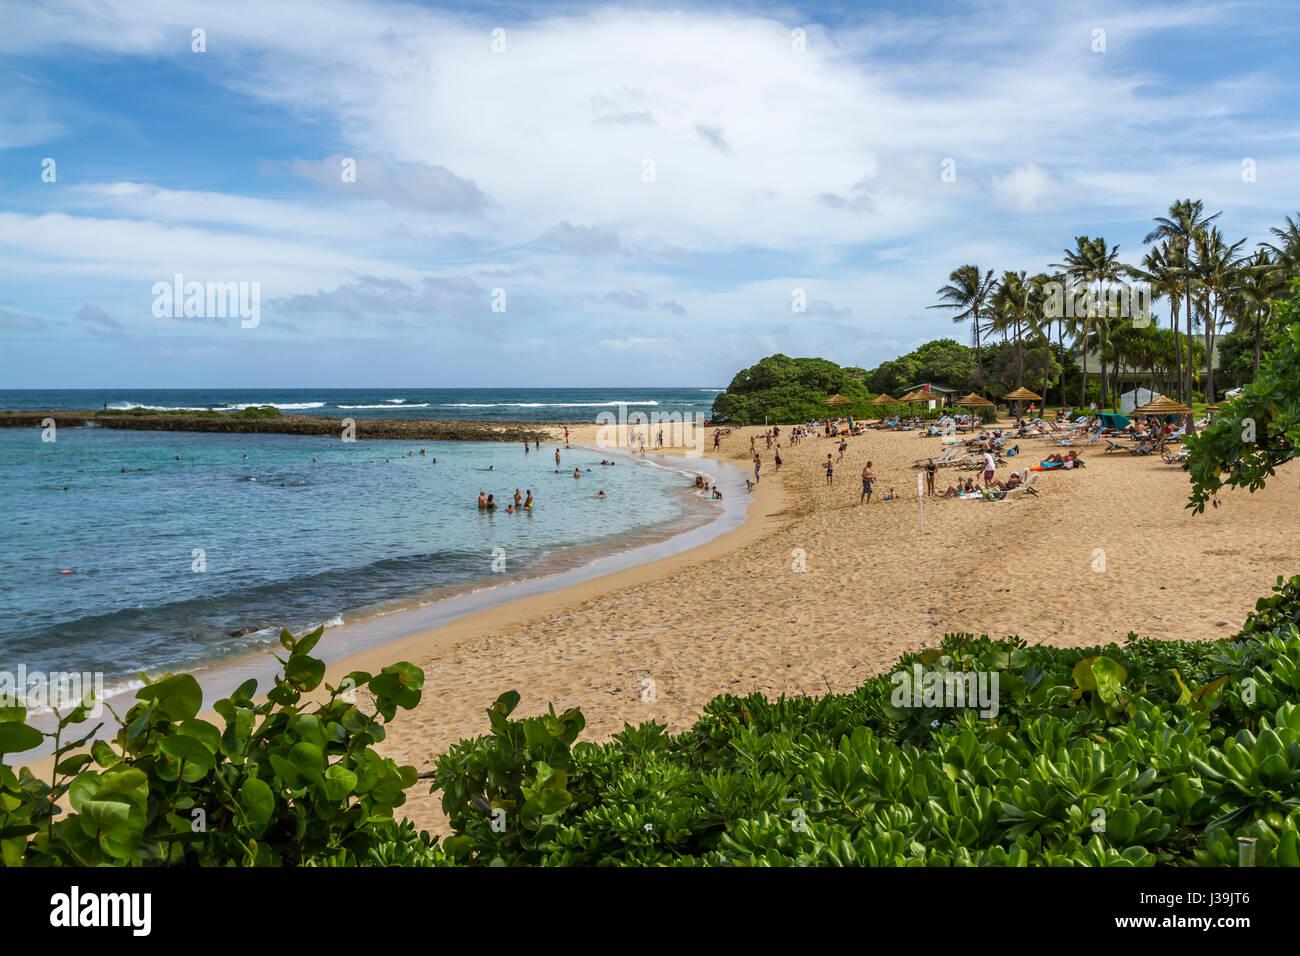 November 2, 2105 Turtle Bay Resort beach, Kahuku Hawaii, Tourists enjoying the beach - Stock Image